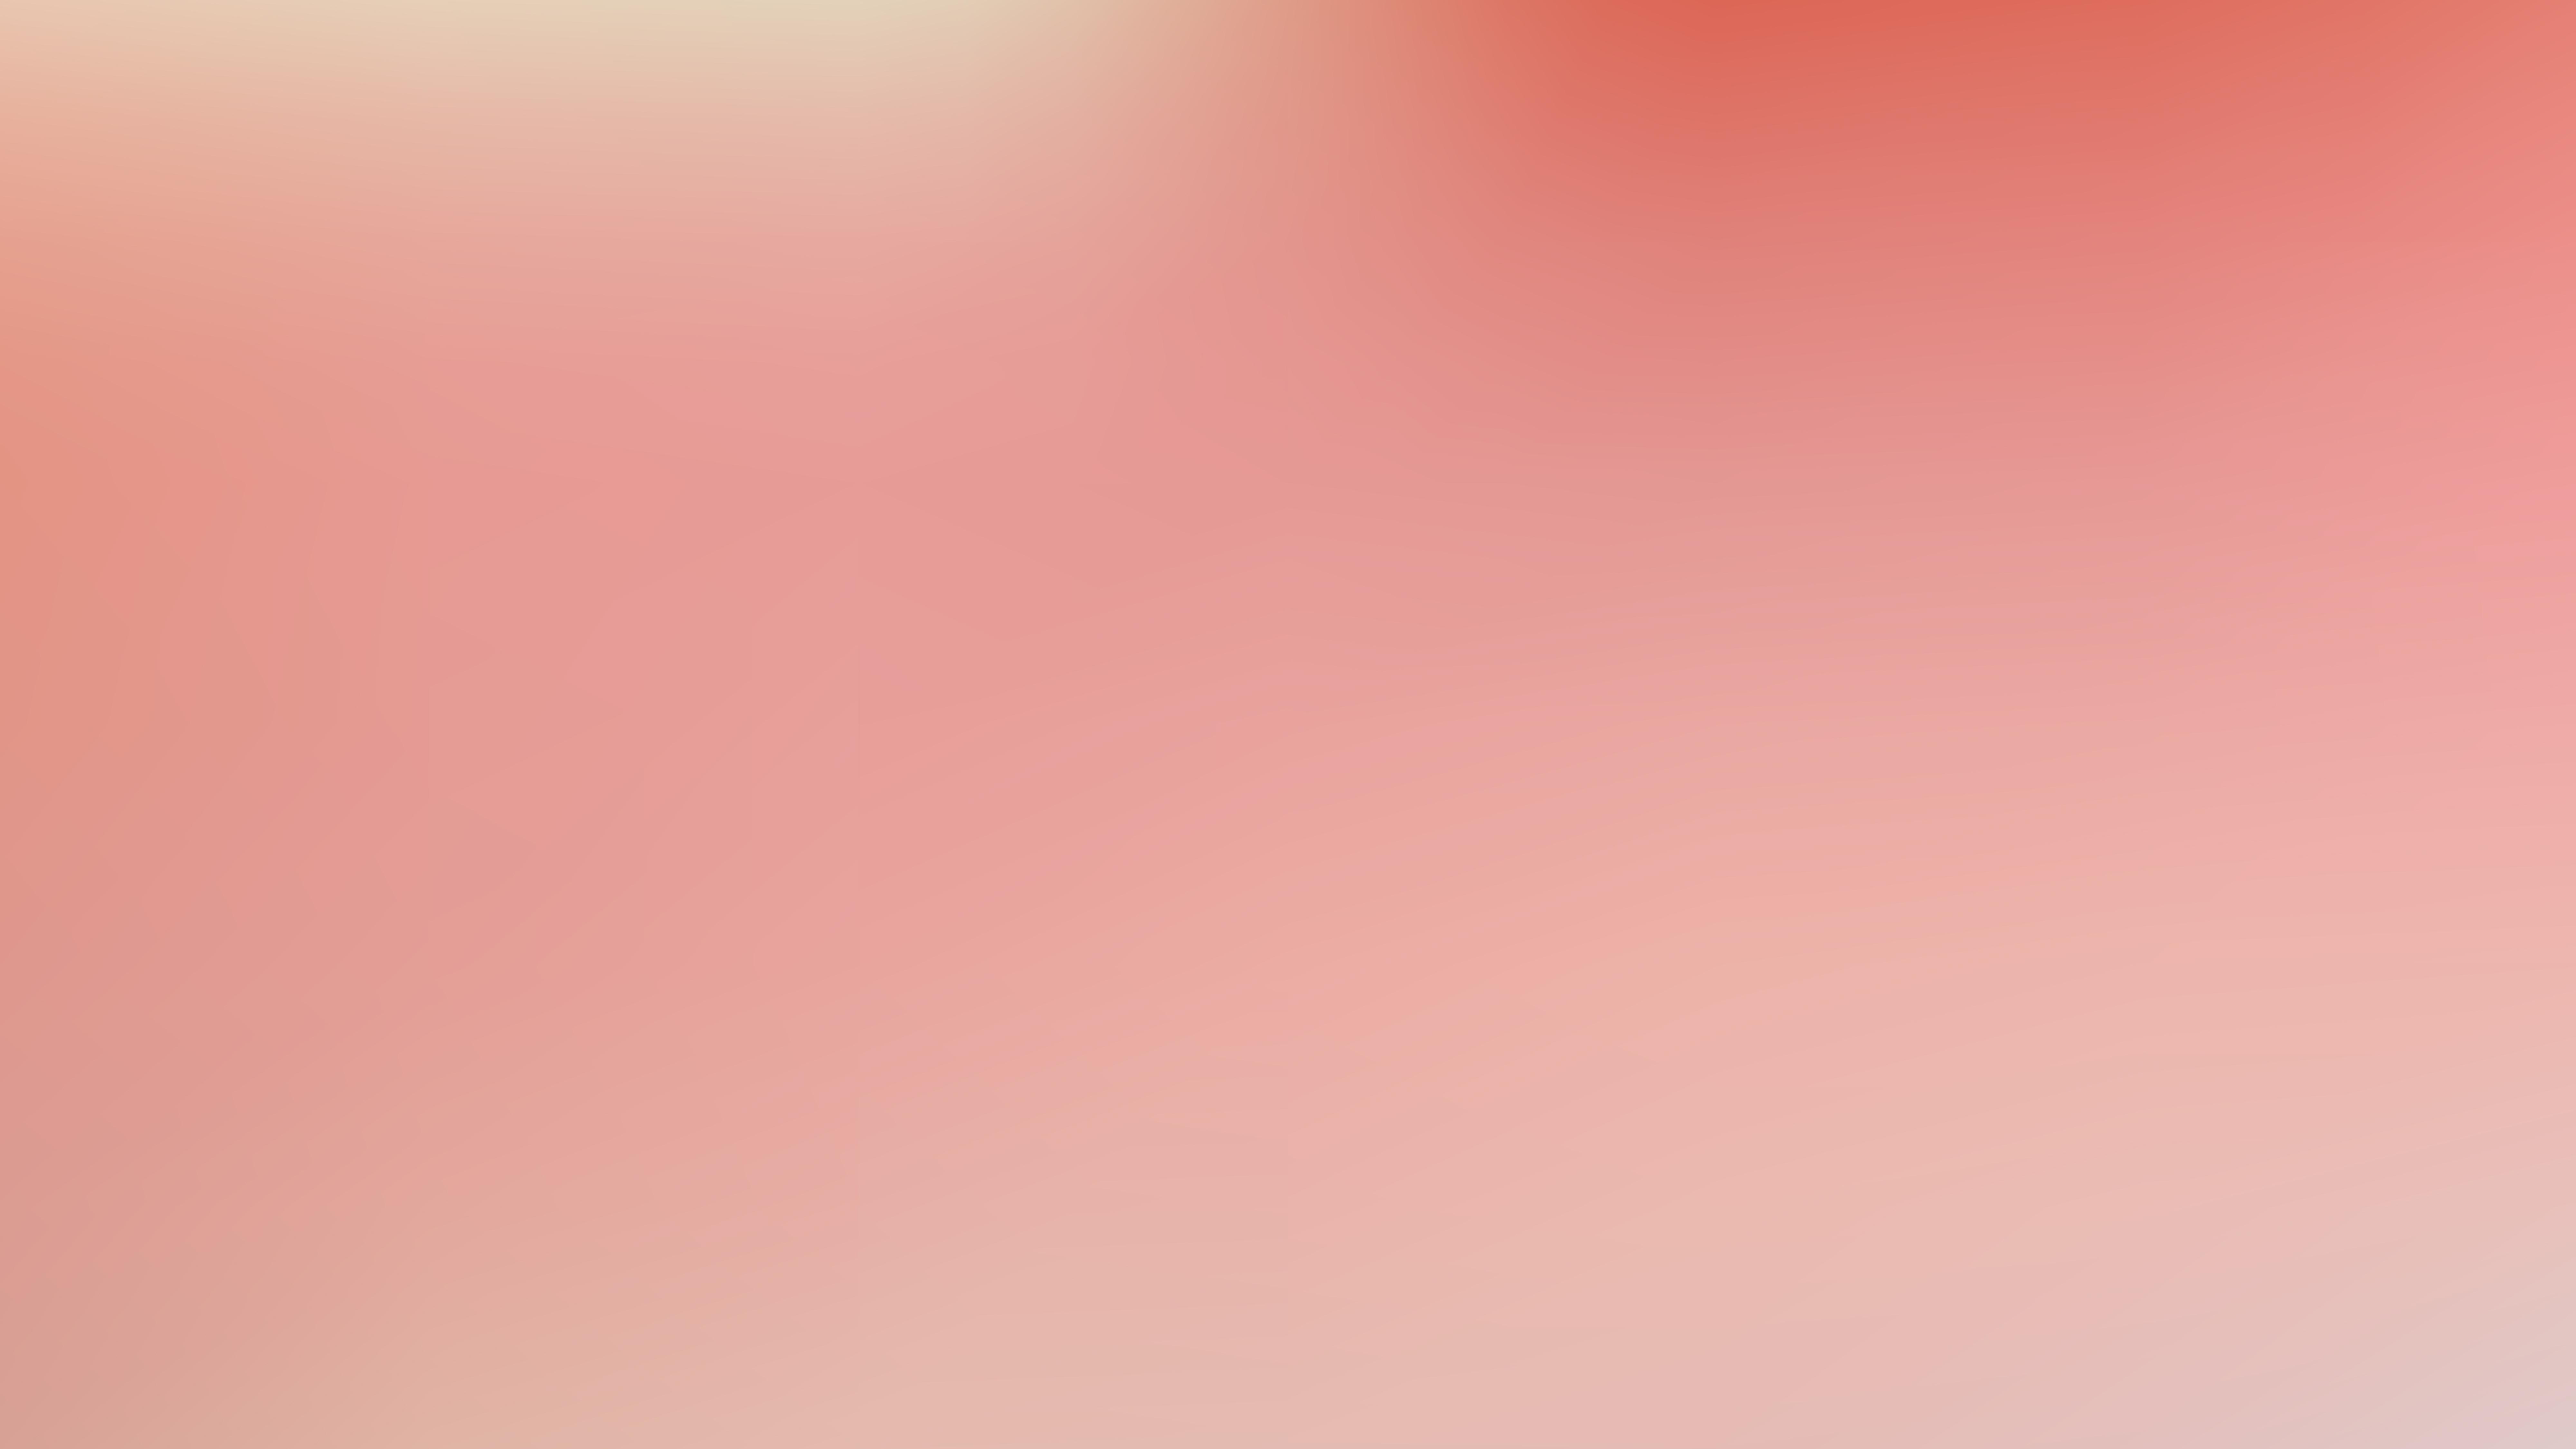 Download 640 Background Ppt Simple Pastel HD Paling Keren